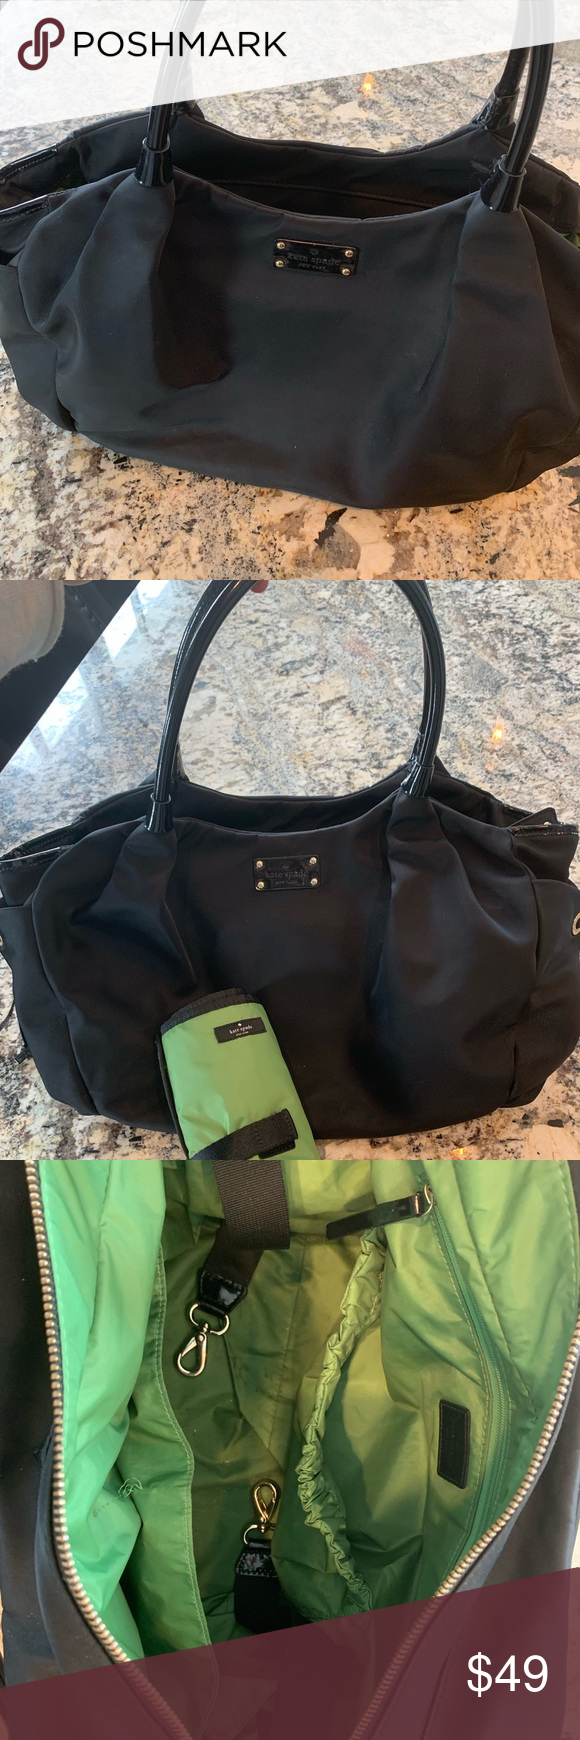 f7c7f289dd24 Kate Spade Black Stevie Diaper Bag w/ Changing pad Kate Spade Black diaper  bag with